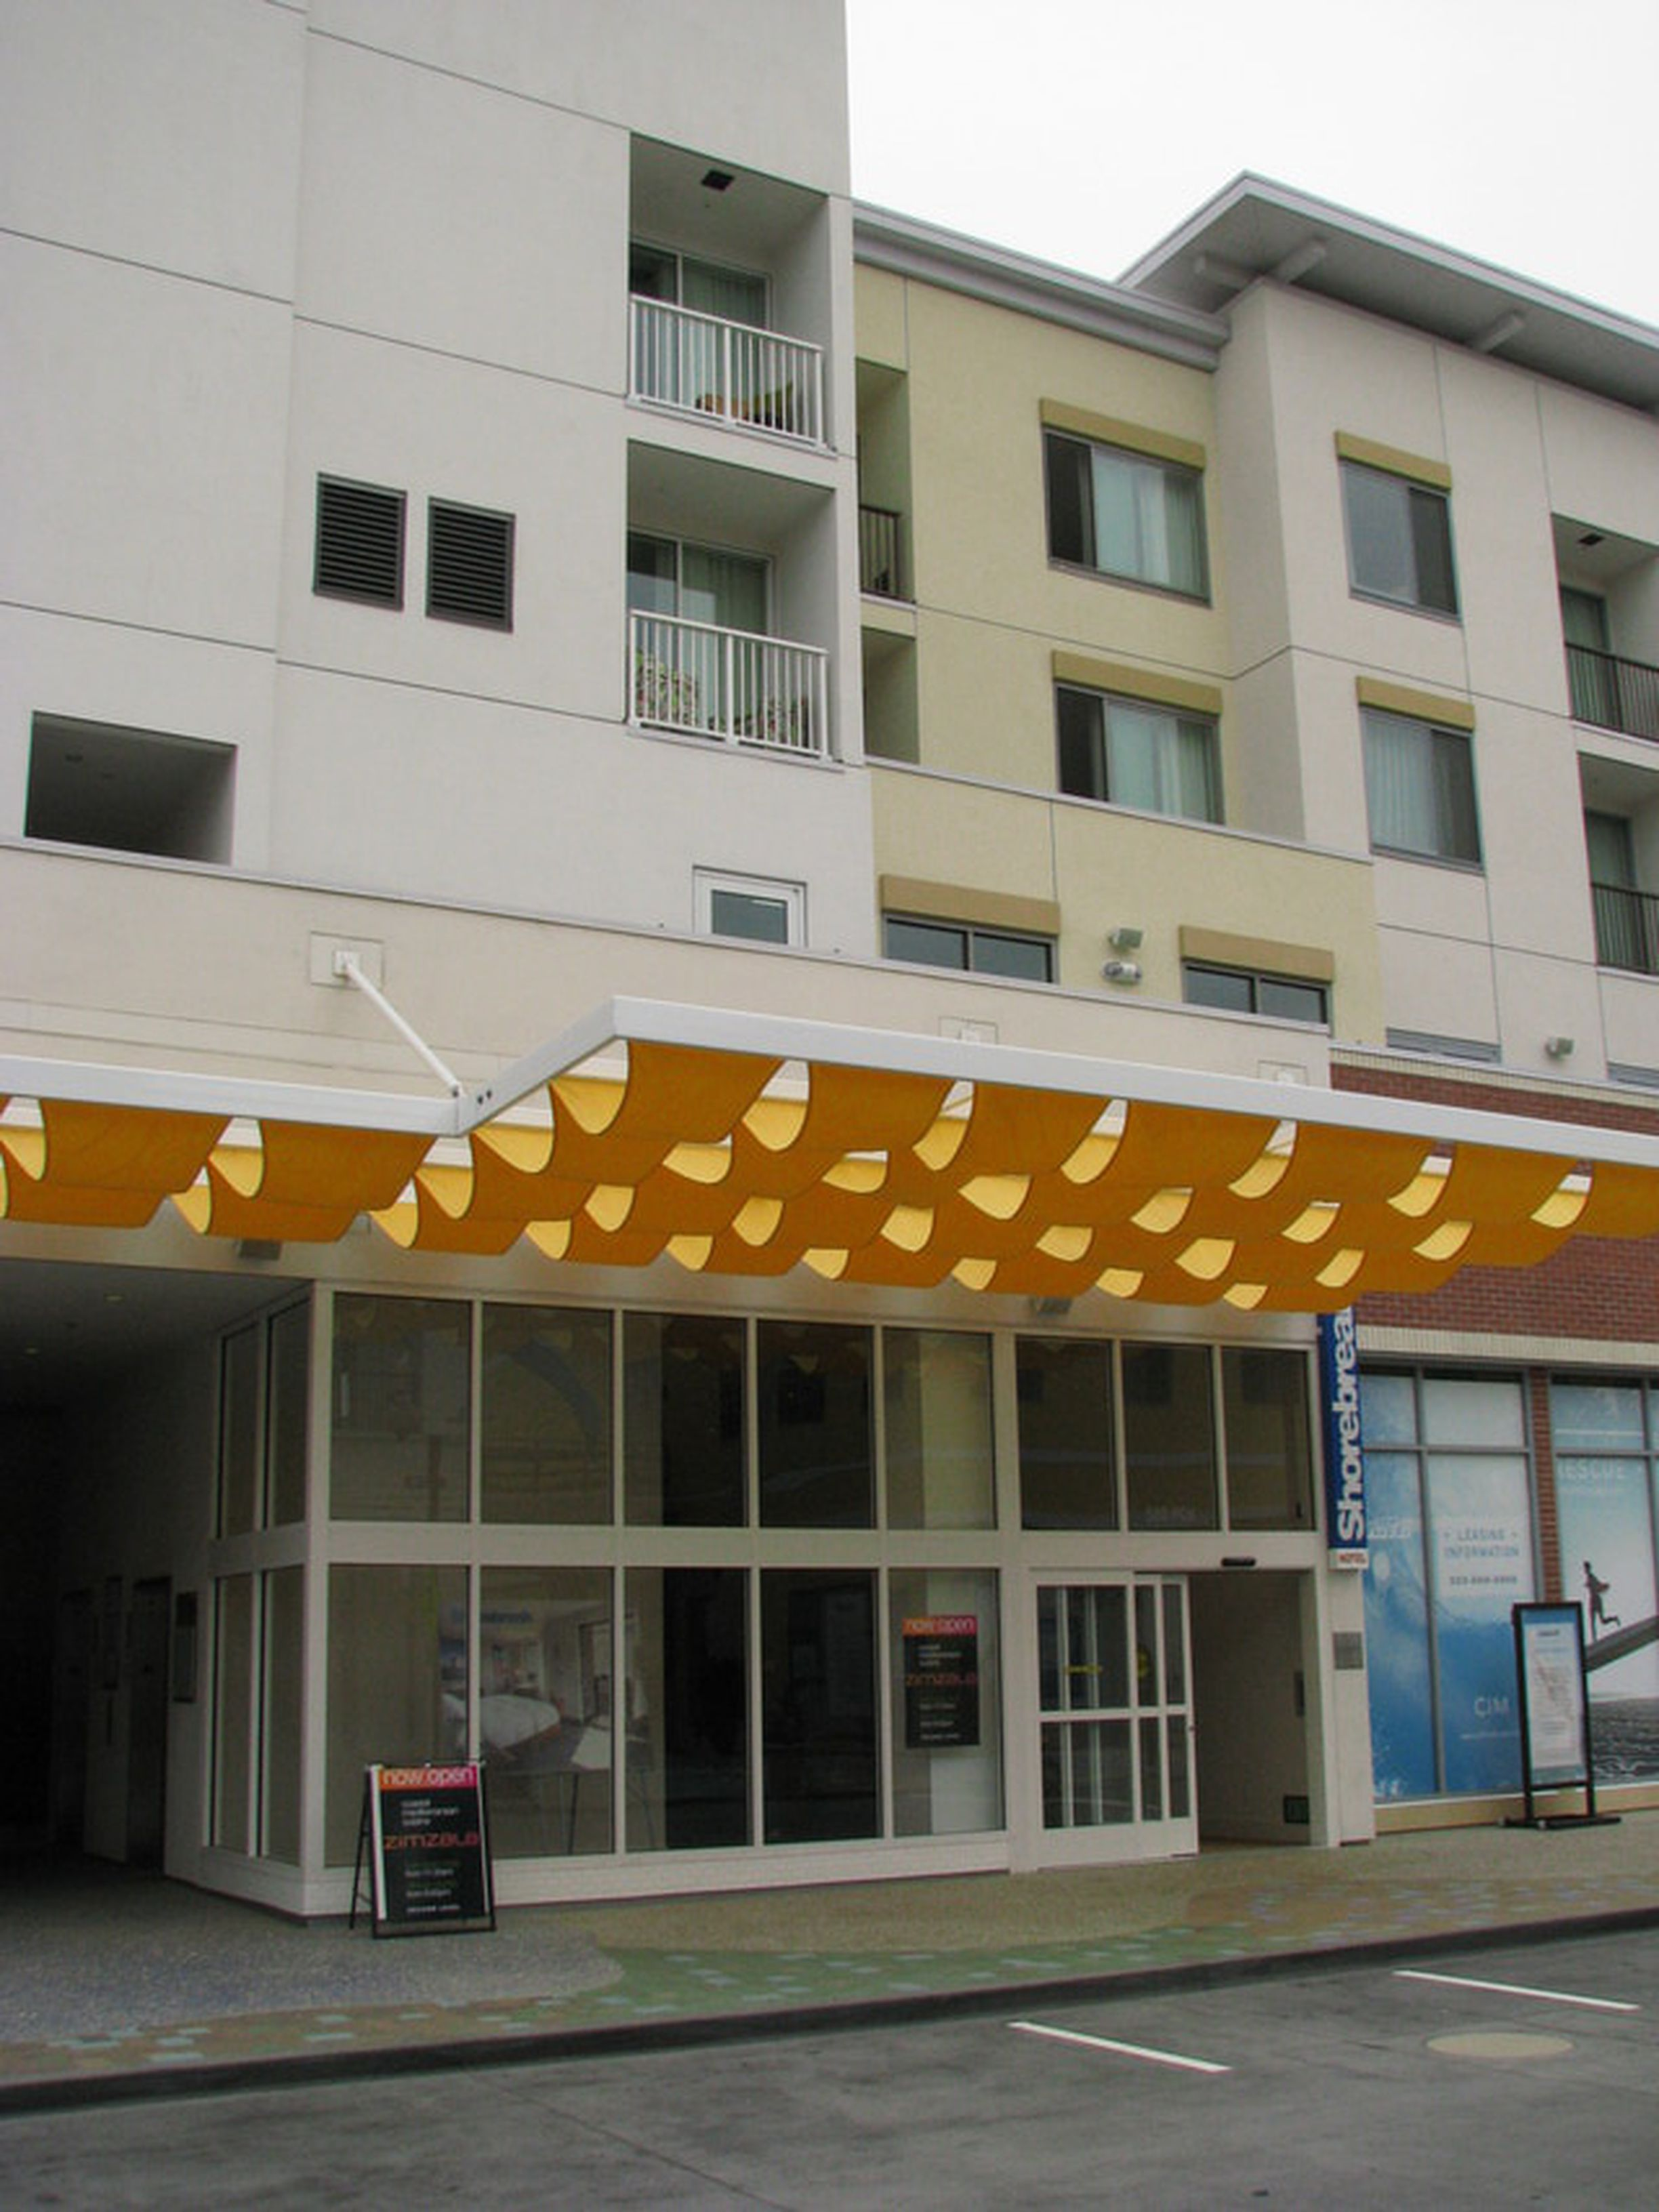 Gay Docking Pics with regard to laguna beach & coastal orange county gay hotels guide